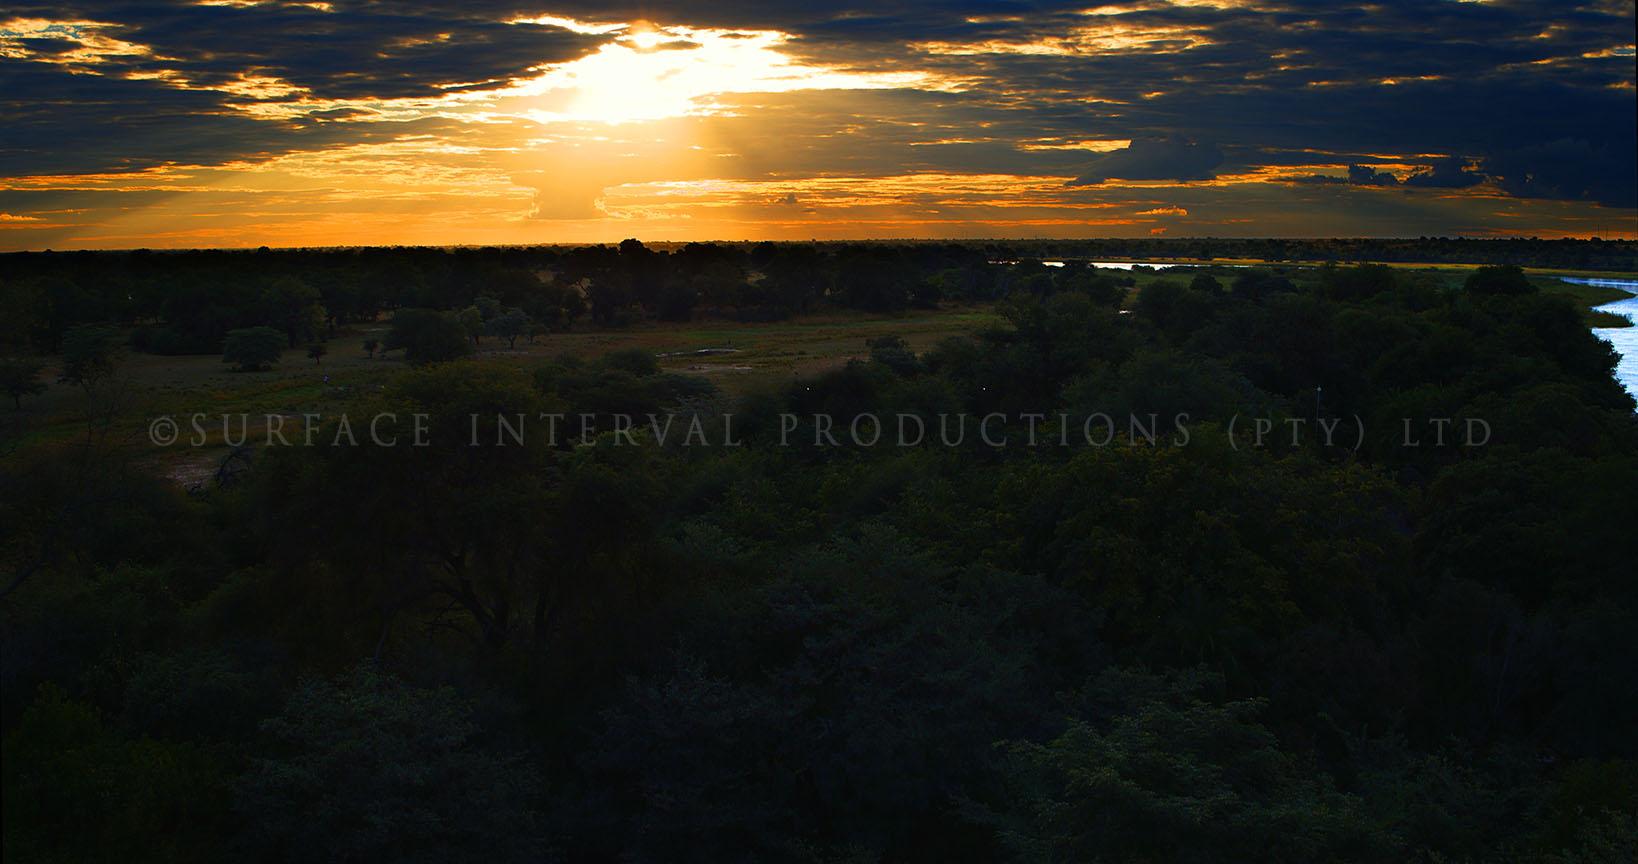 Sunset-rise 11.jpg